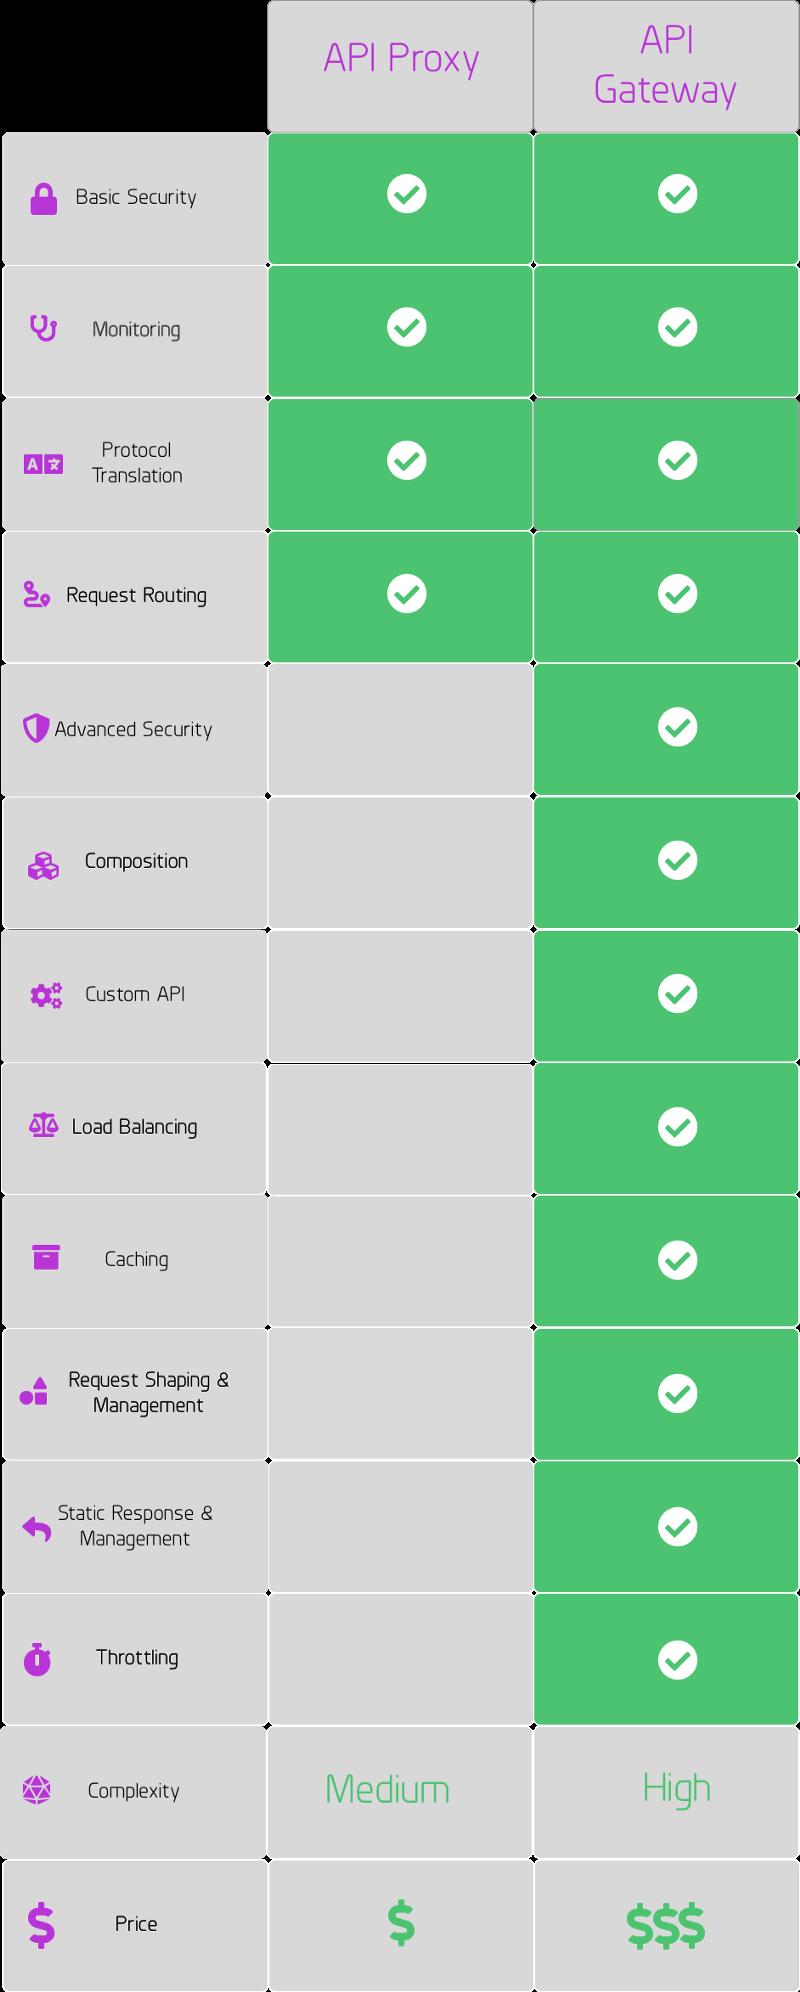 API Proxy versus API Gateway